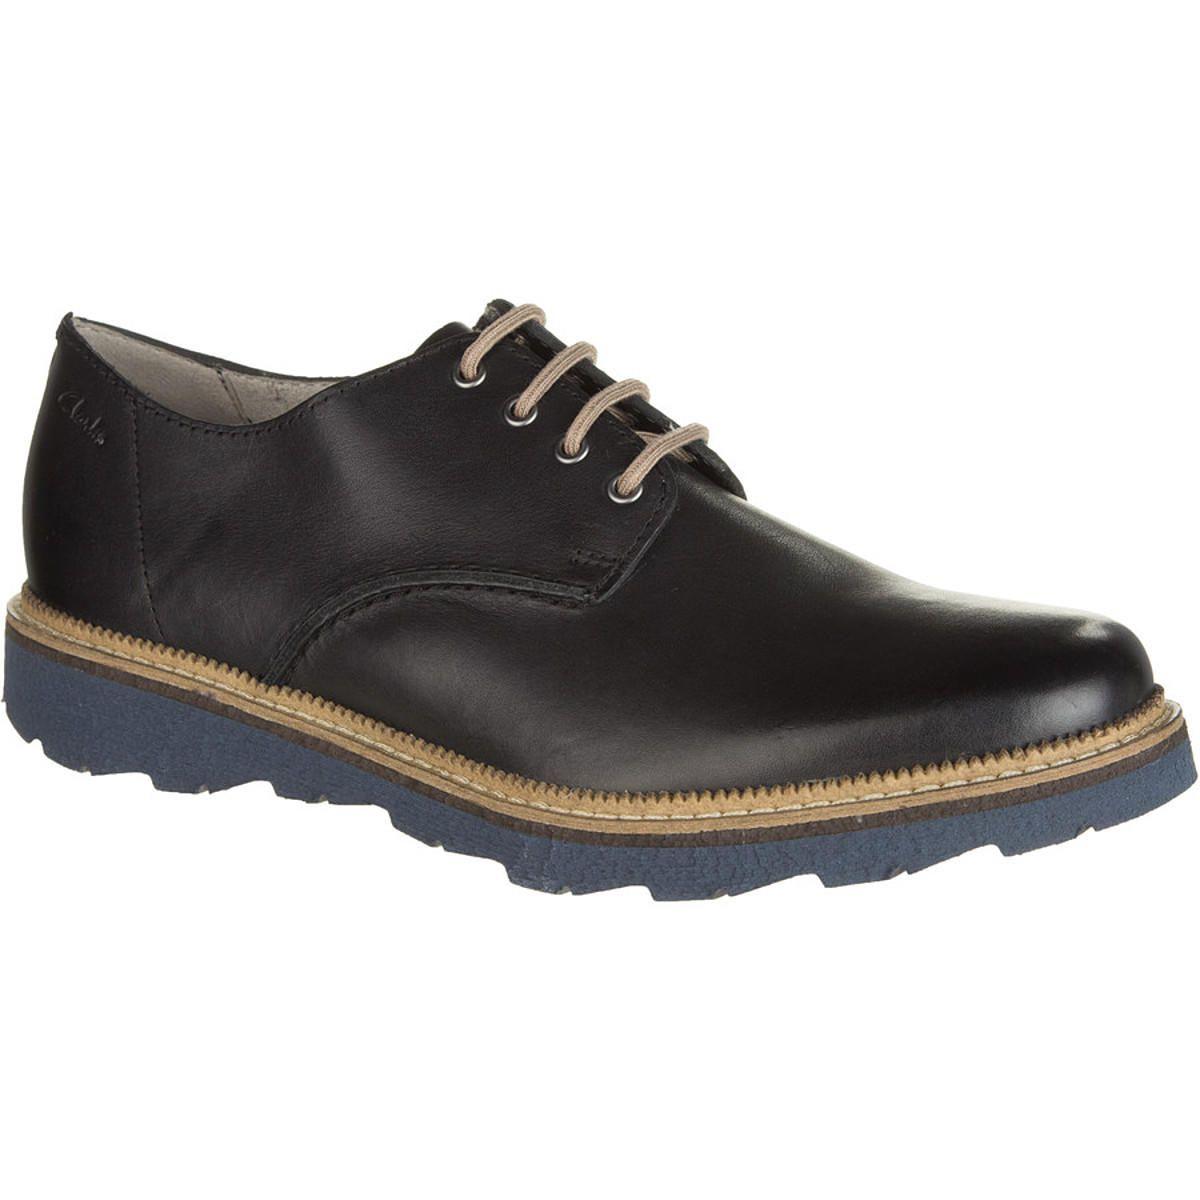 a9337ed4e5e895 Clarks Frelan Walk Shoe - Men s from Backcountry.com. Saved to Corey !. Shop  more products from Backcountry.com on Wanelo.